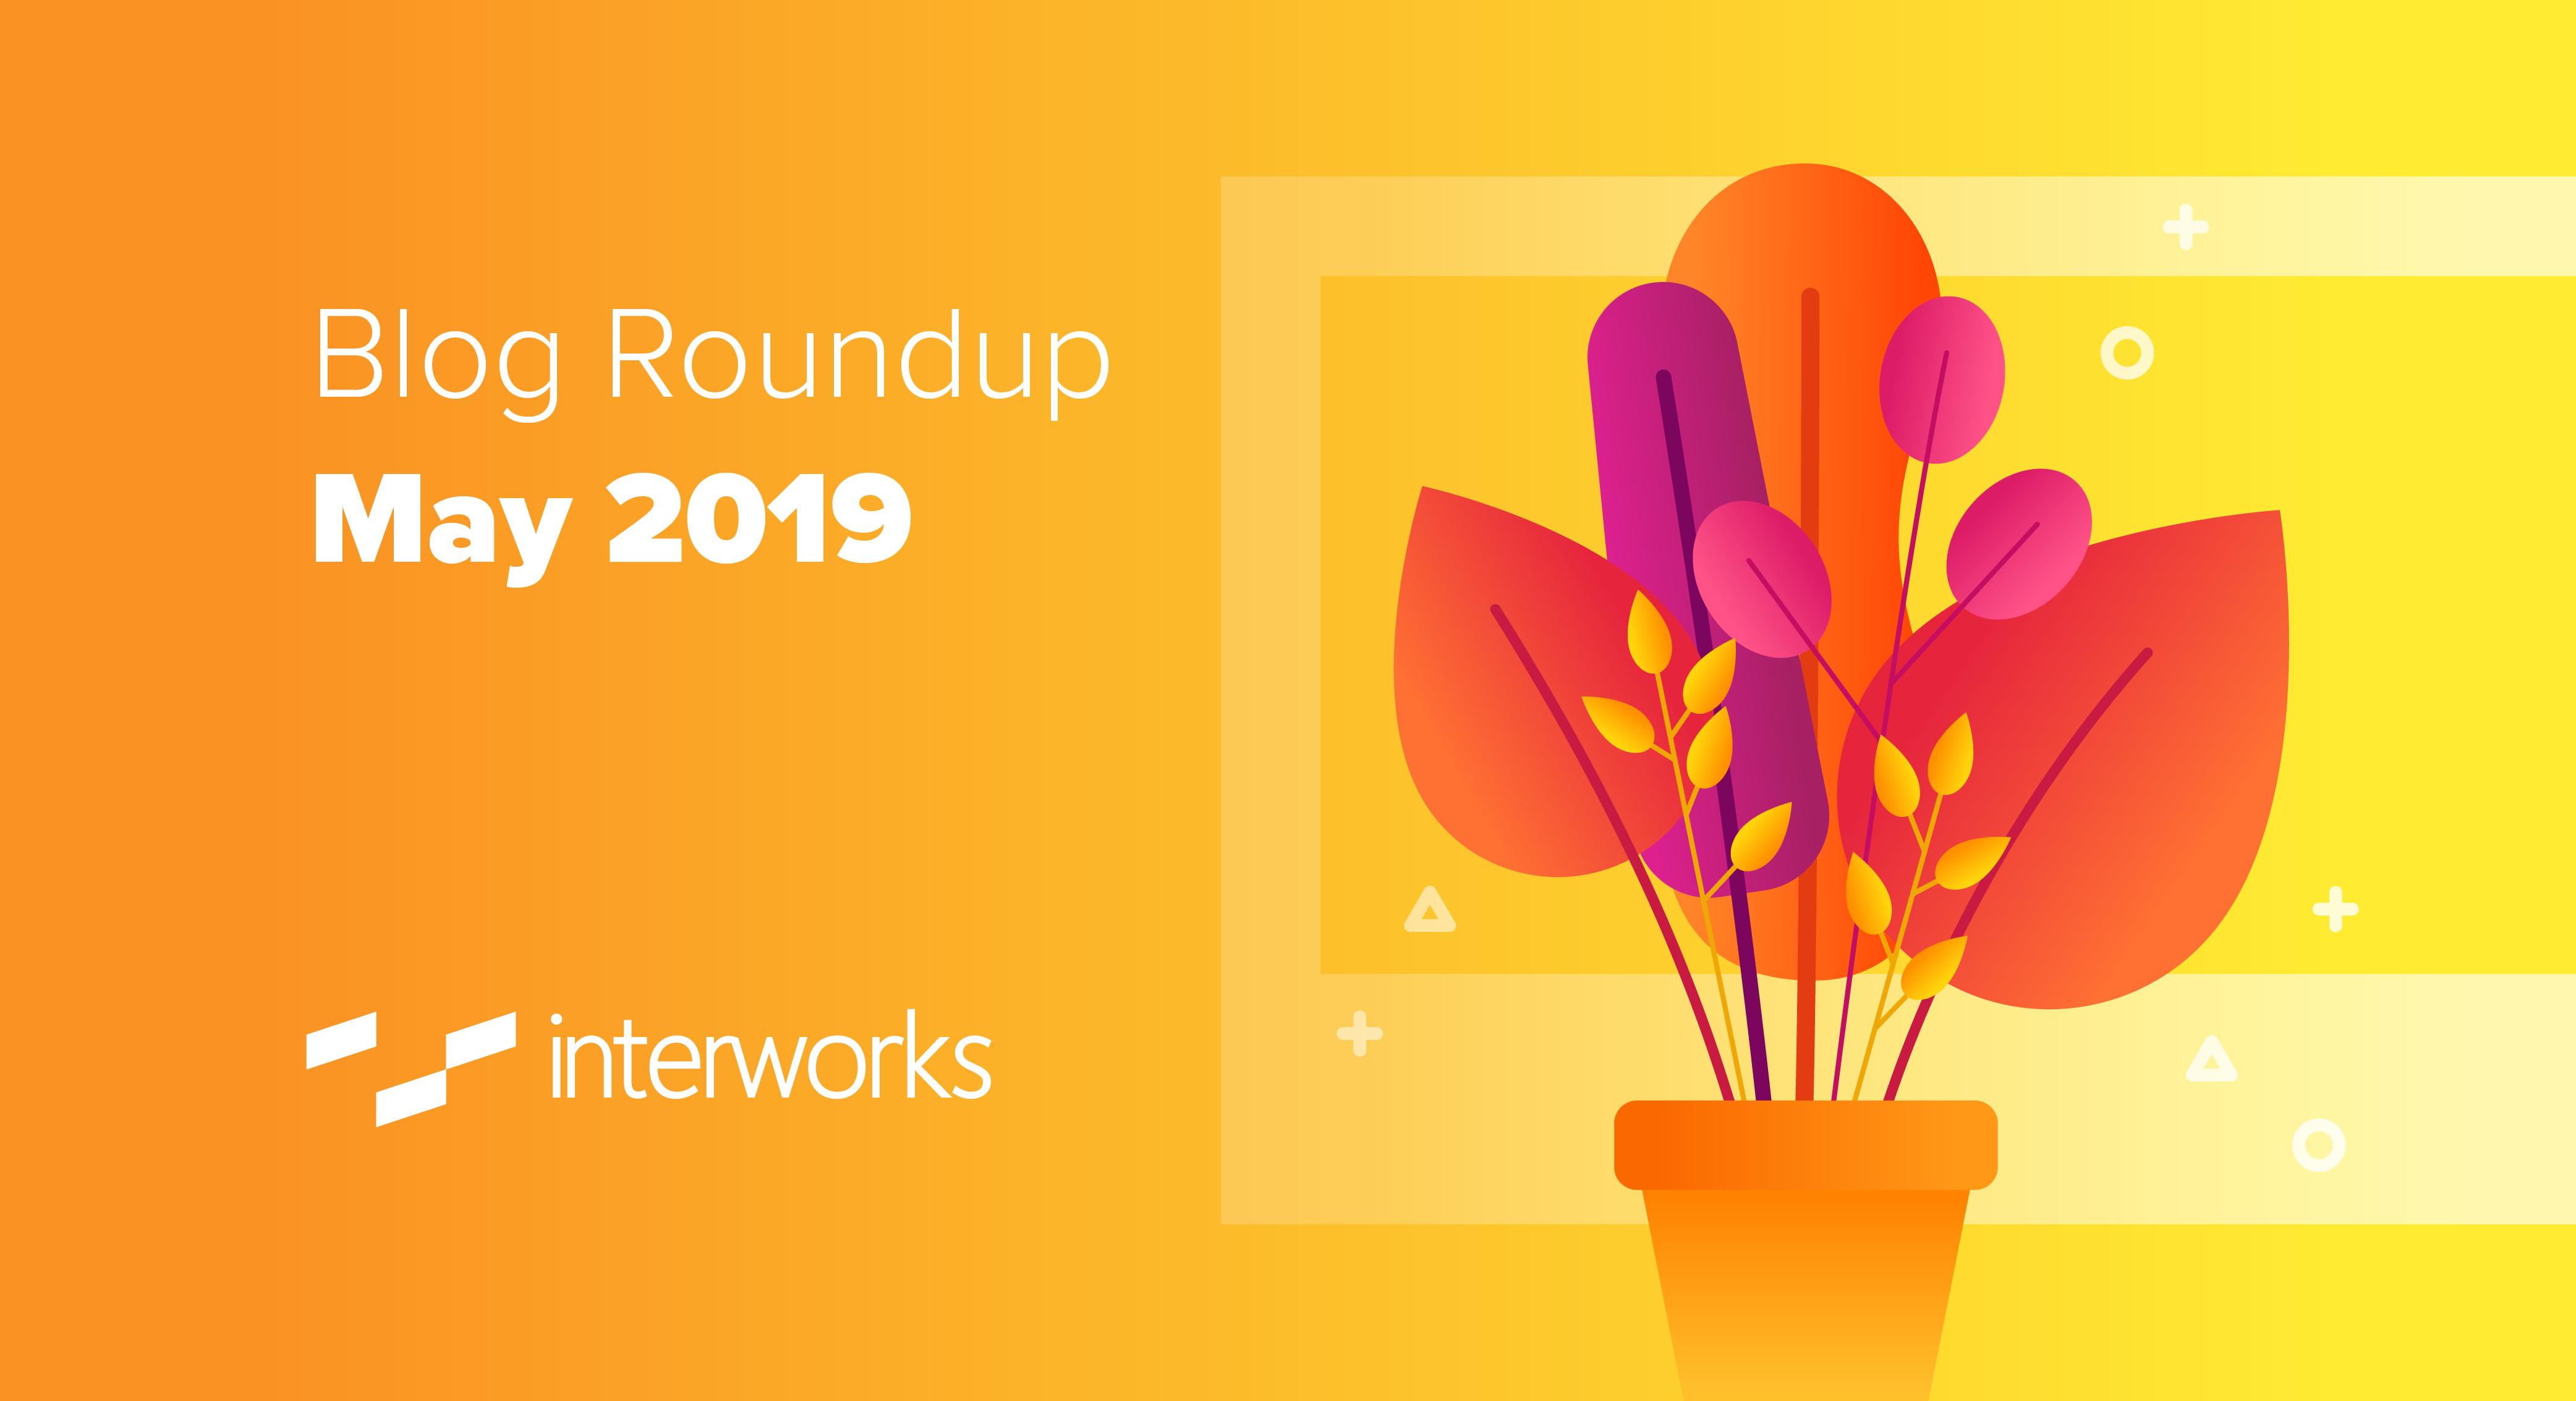 InterWorks Blog Roundup - May 2019